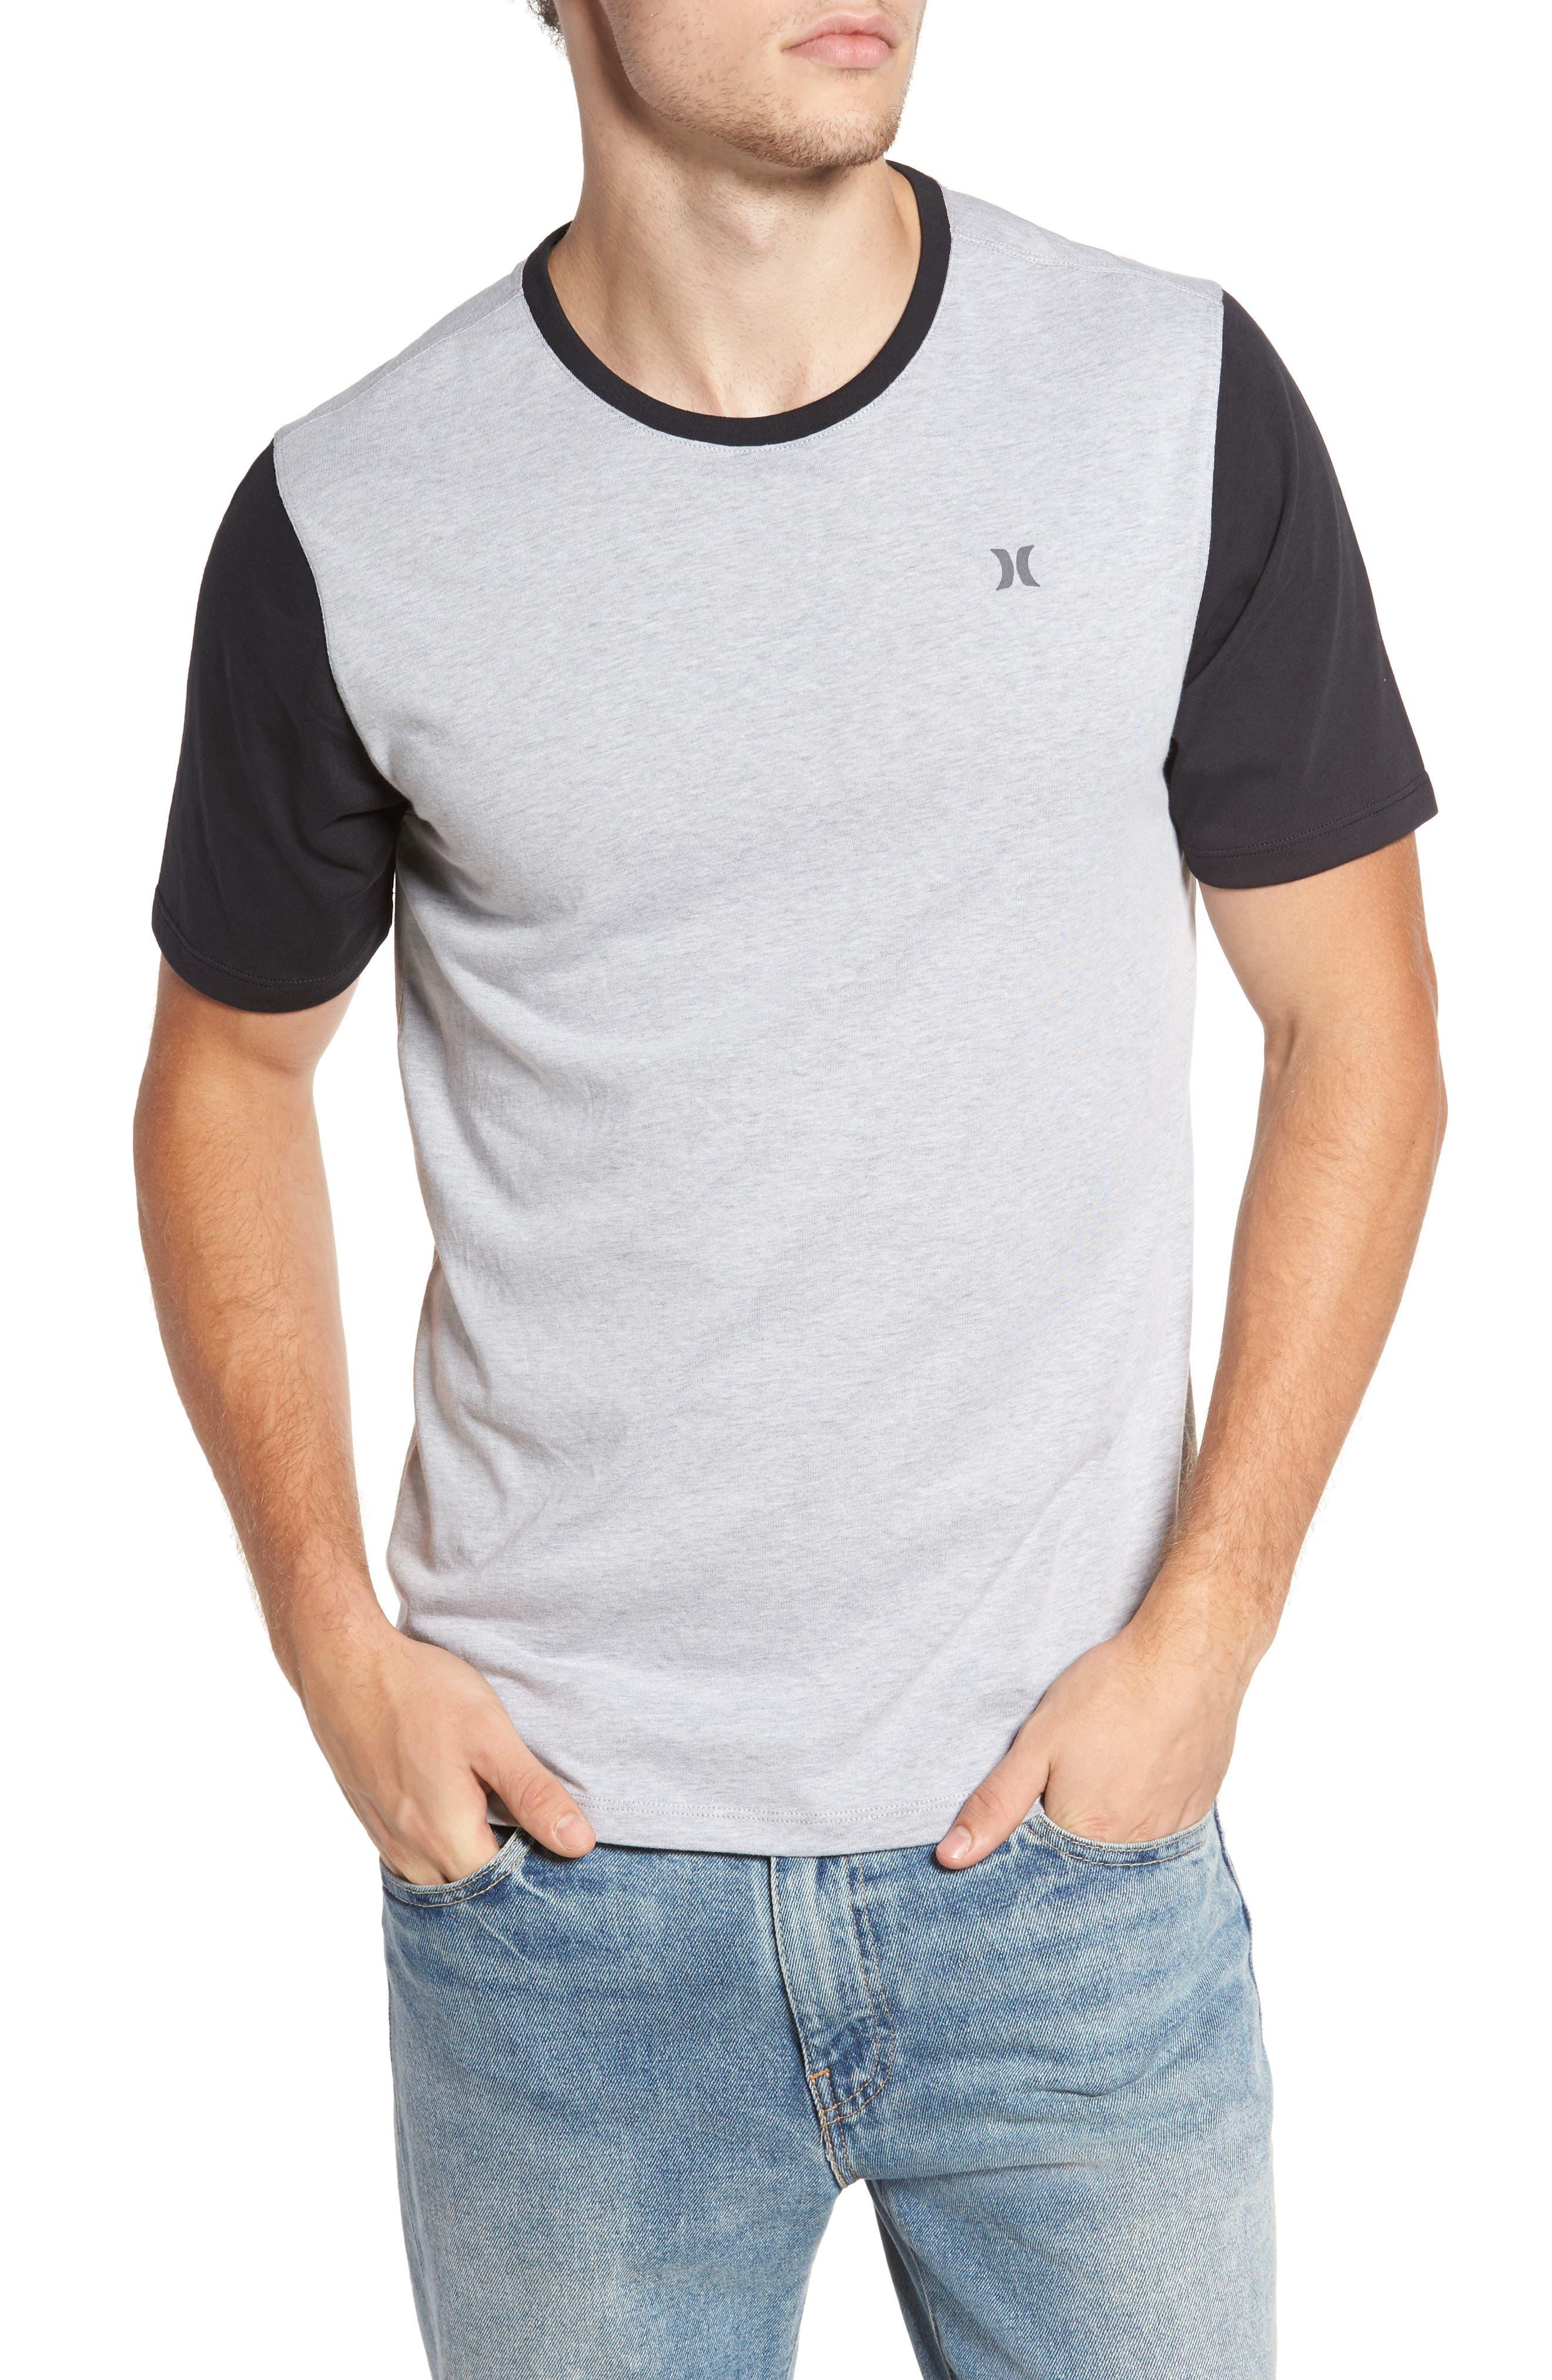 Lagos Snapper Dri-FIT T-Shirt,                             Main thumbnail 1, color,                             059